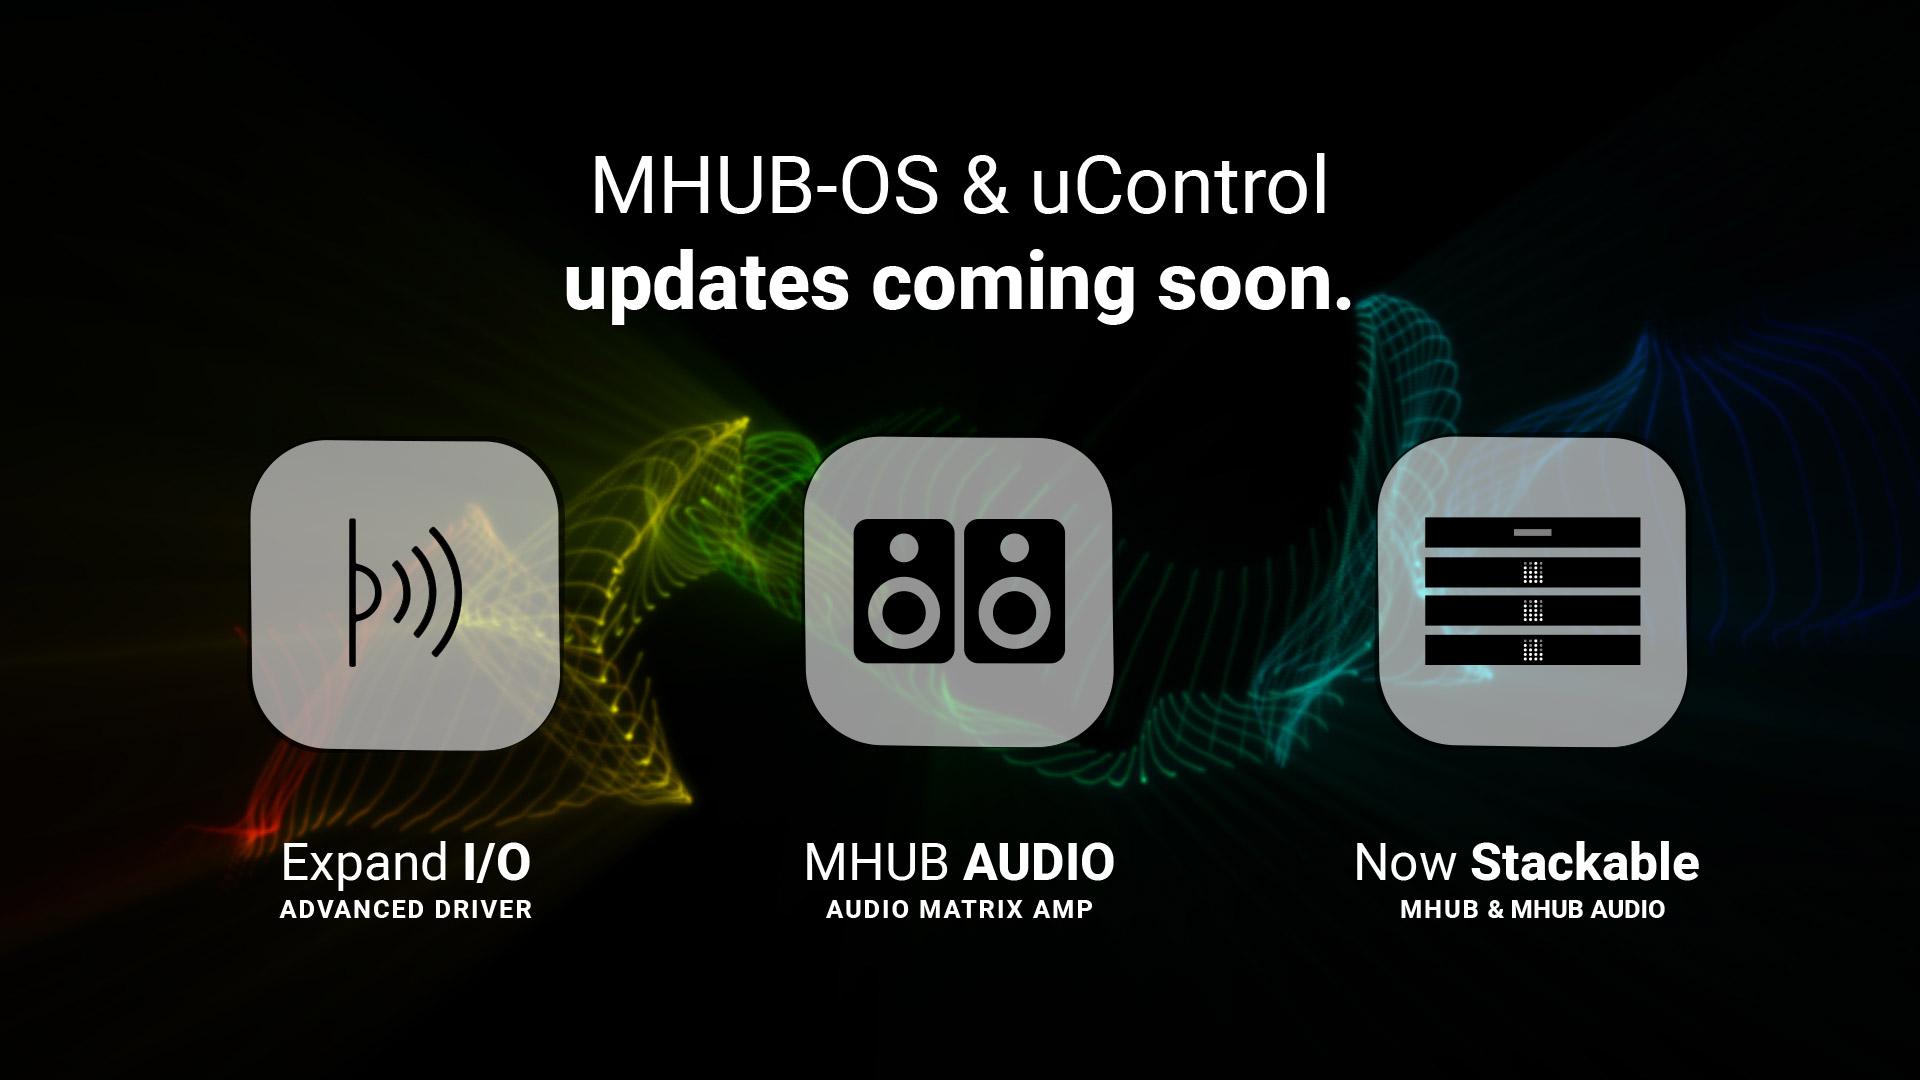 MHUB-OS 8 and uControl 2